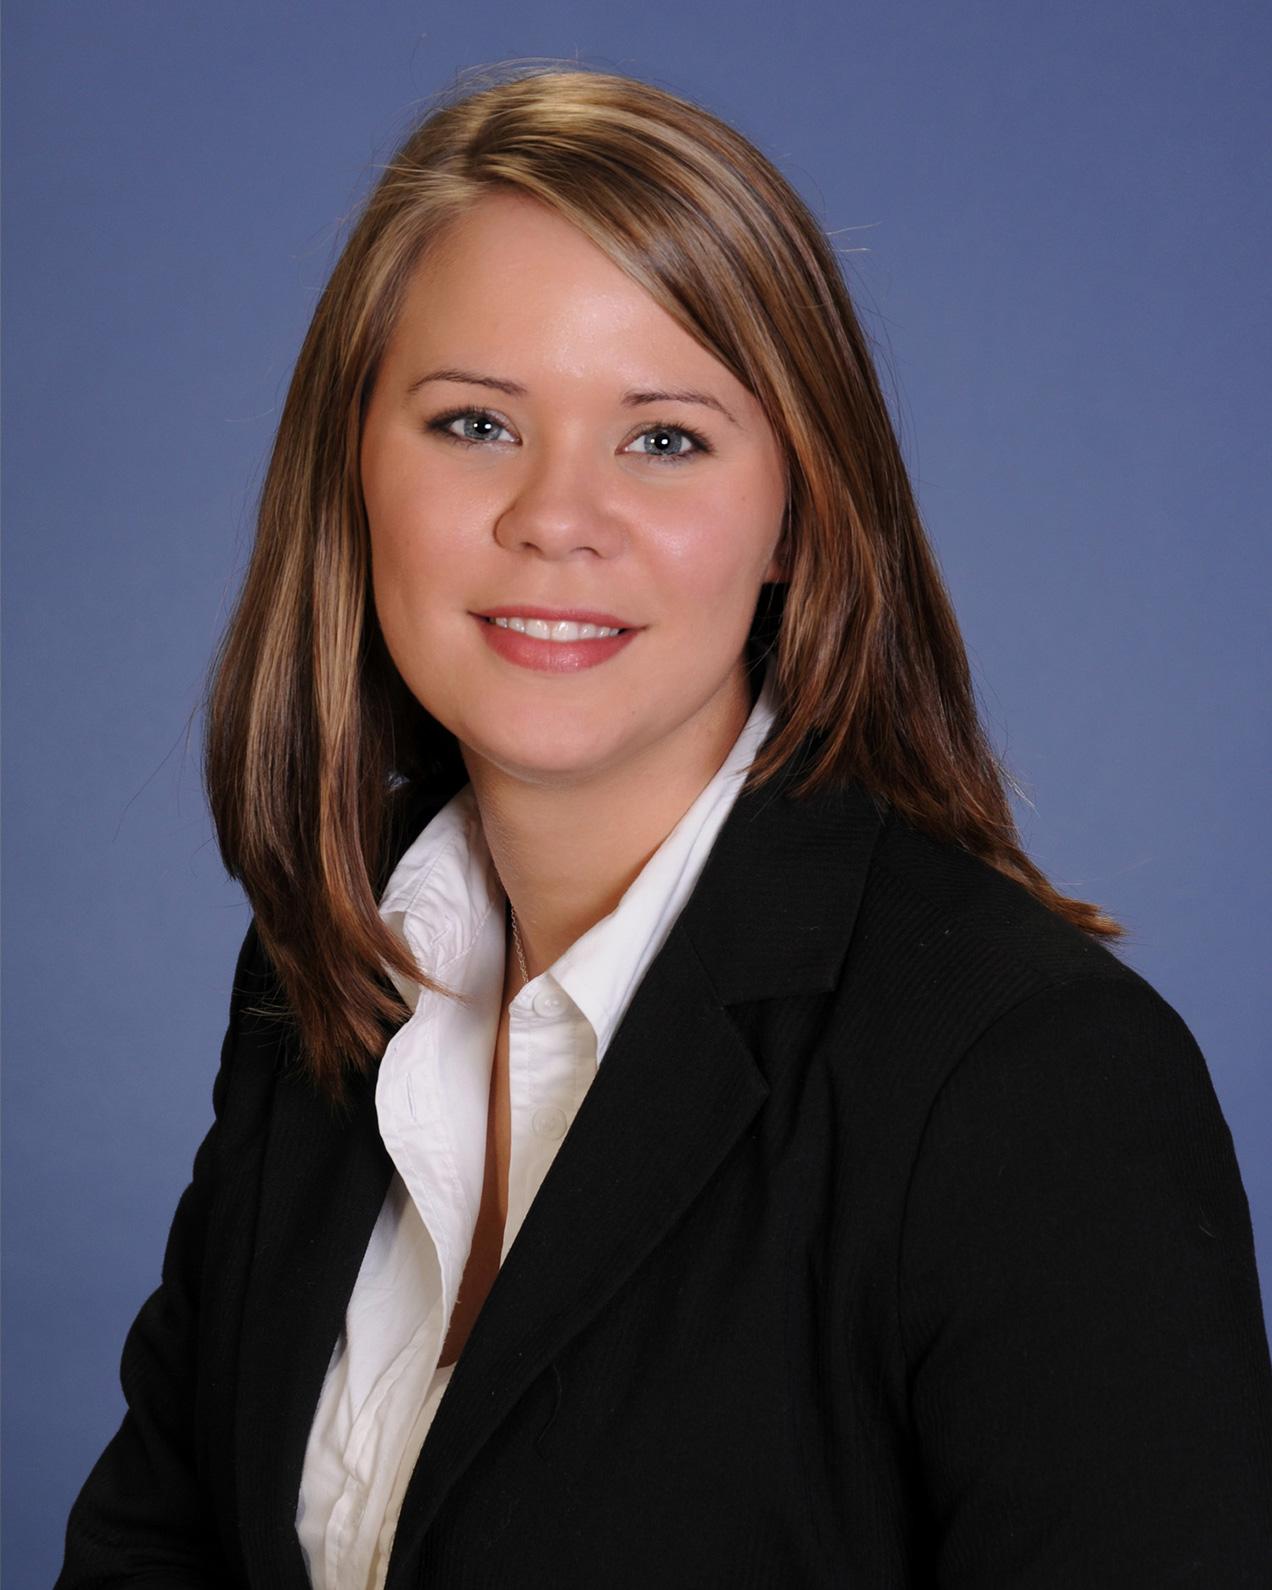 Headshot of Laura Kinney